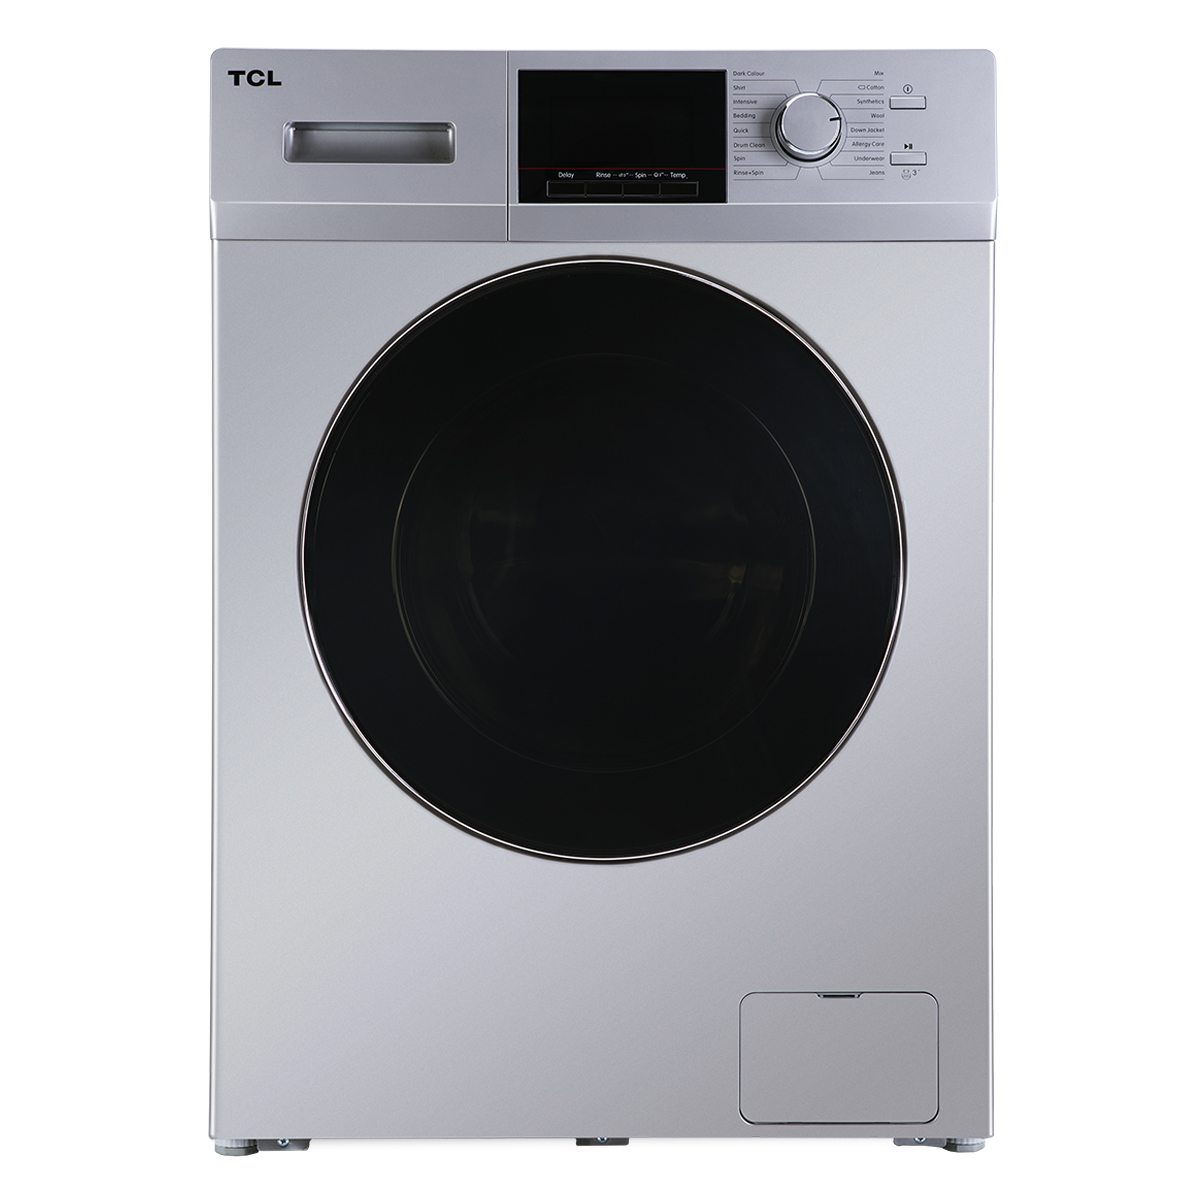 ماشین لباسشویی تی سی ال مدل TWM-804SBI ظرفیت 8 کیلوگرم